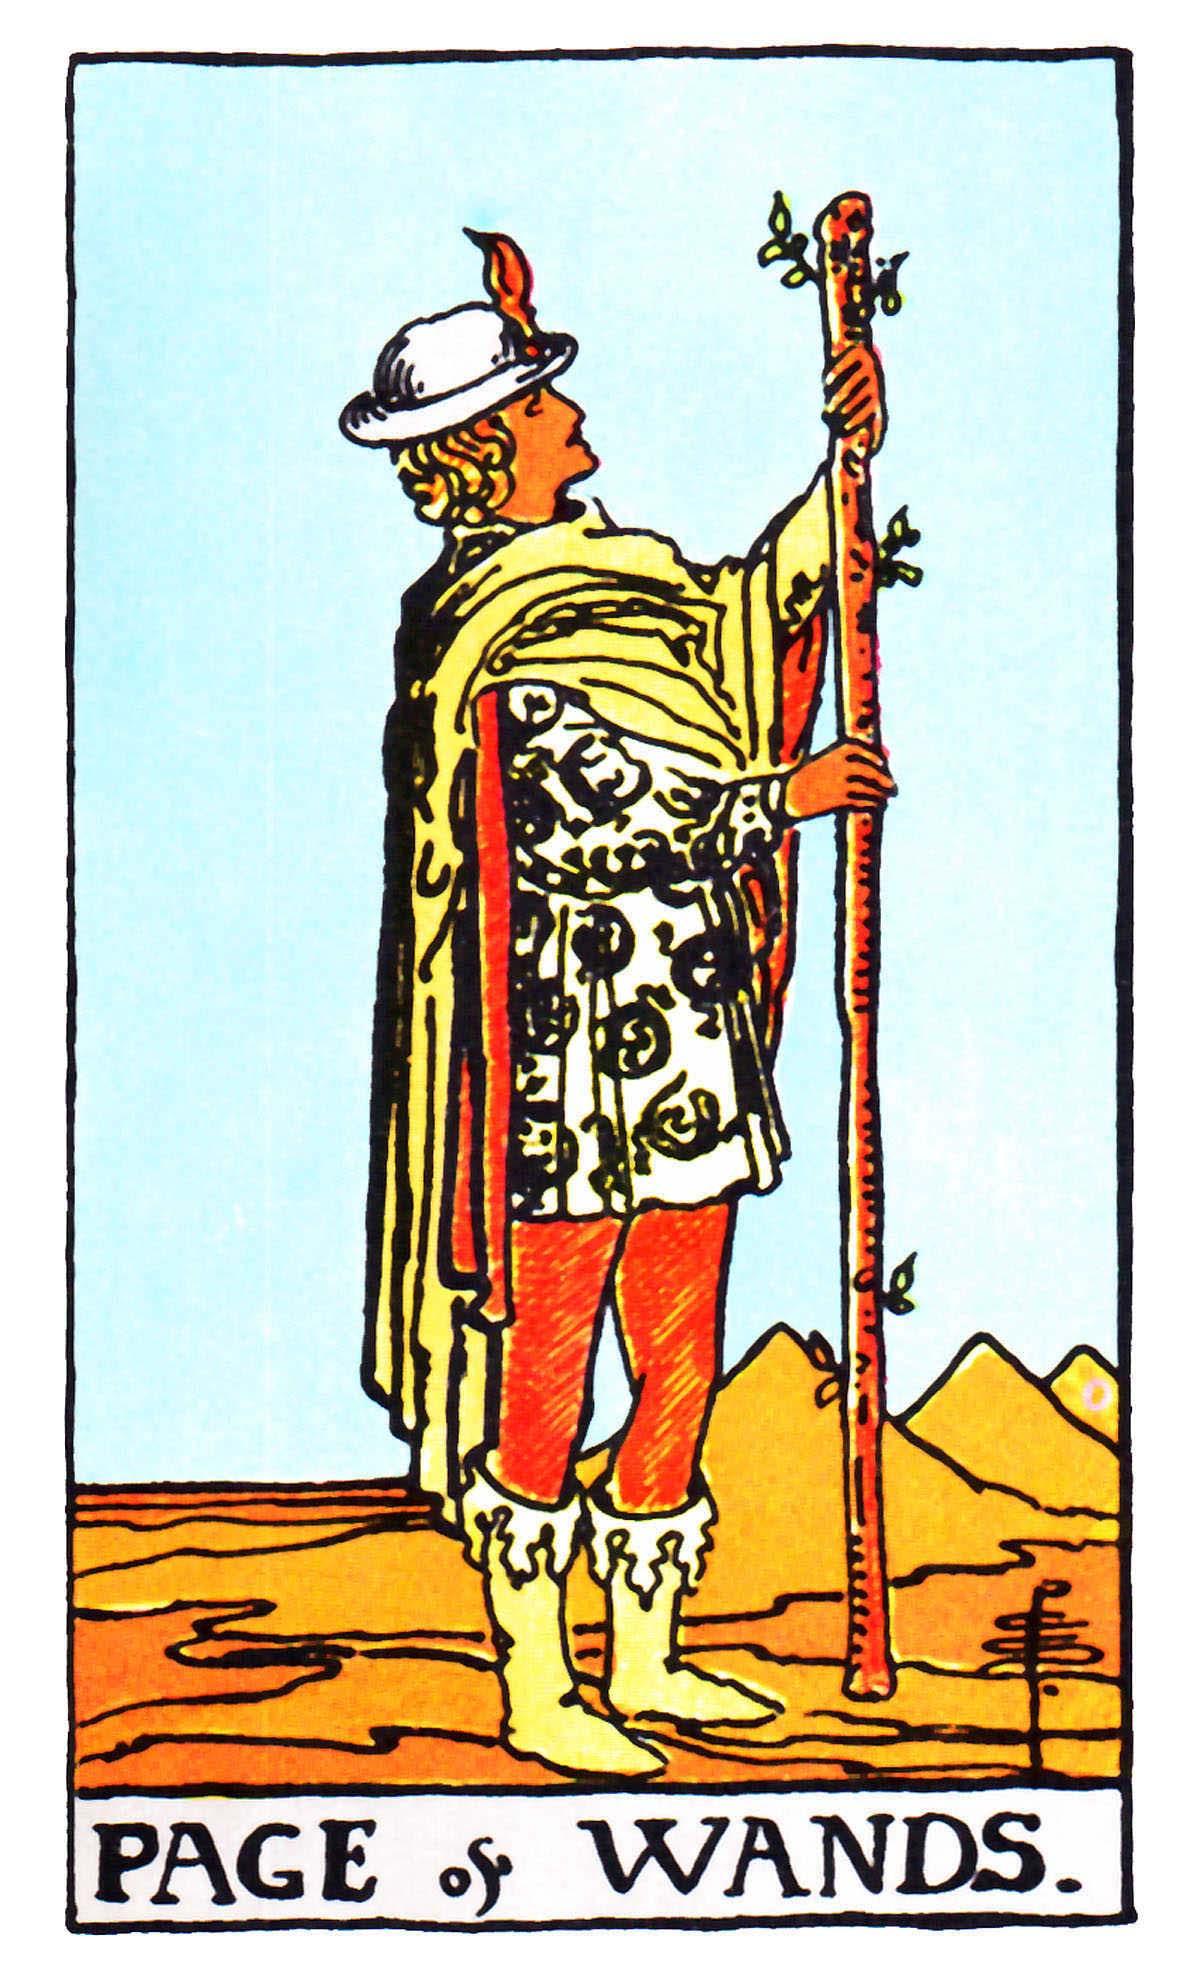 權杖侍從 Page of Wands 塔羅牌牌意